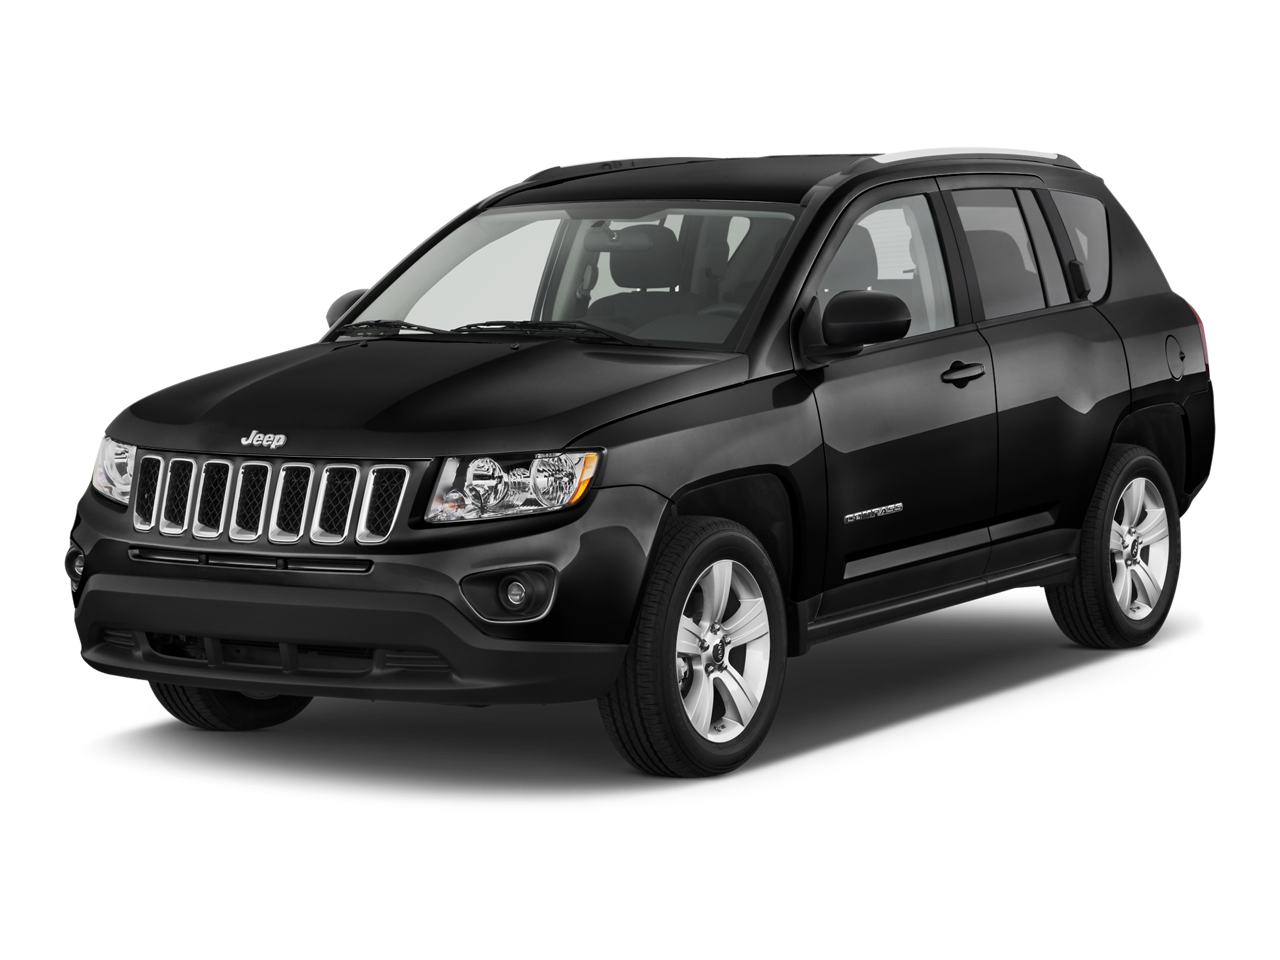 Chrysler Dodge And Jeep Dealer Gainesville GA New Used Cars For - Closest chrysler dealer